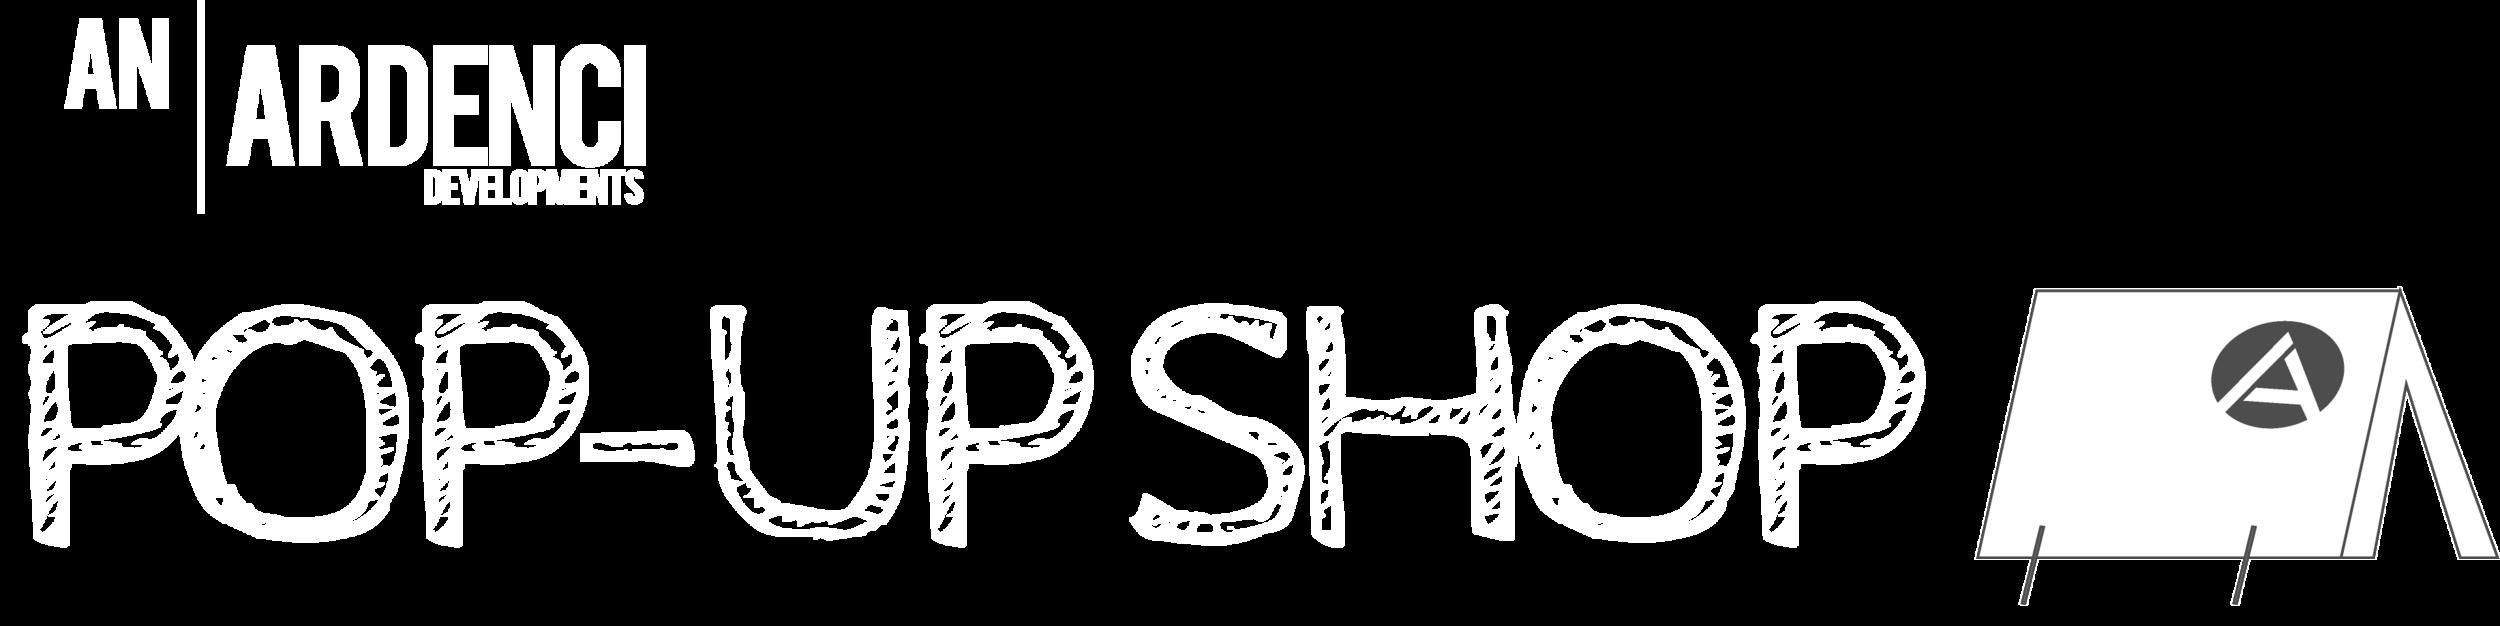 Pop-Up Shop (Horiztonal No Background)@300ppi.png